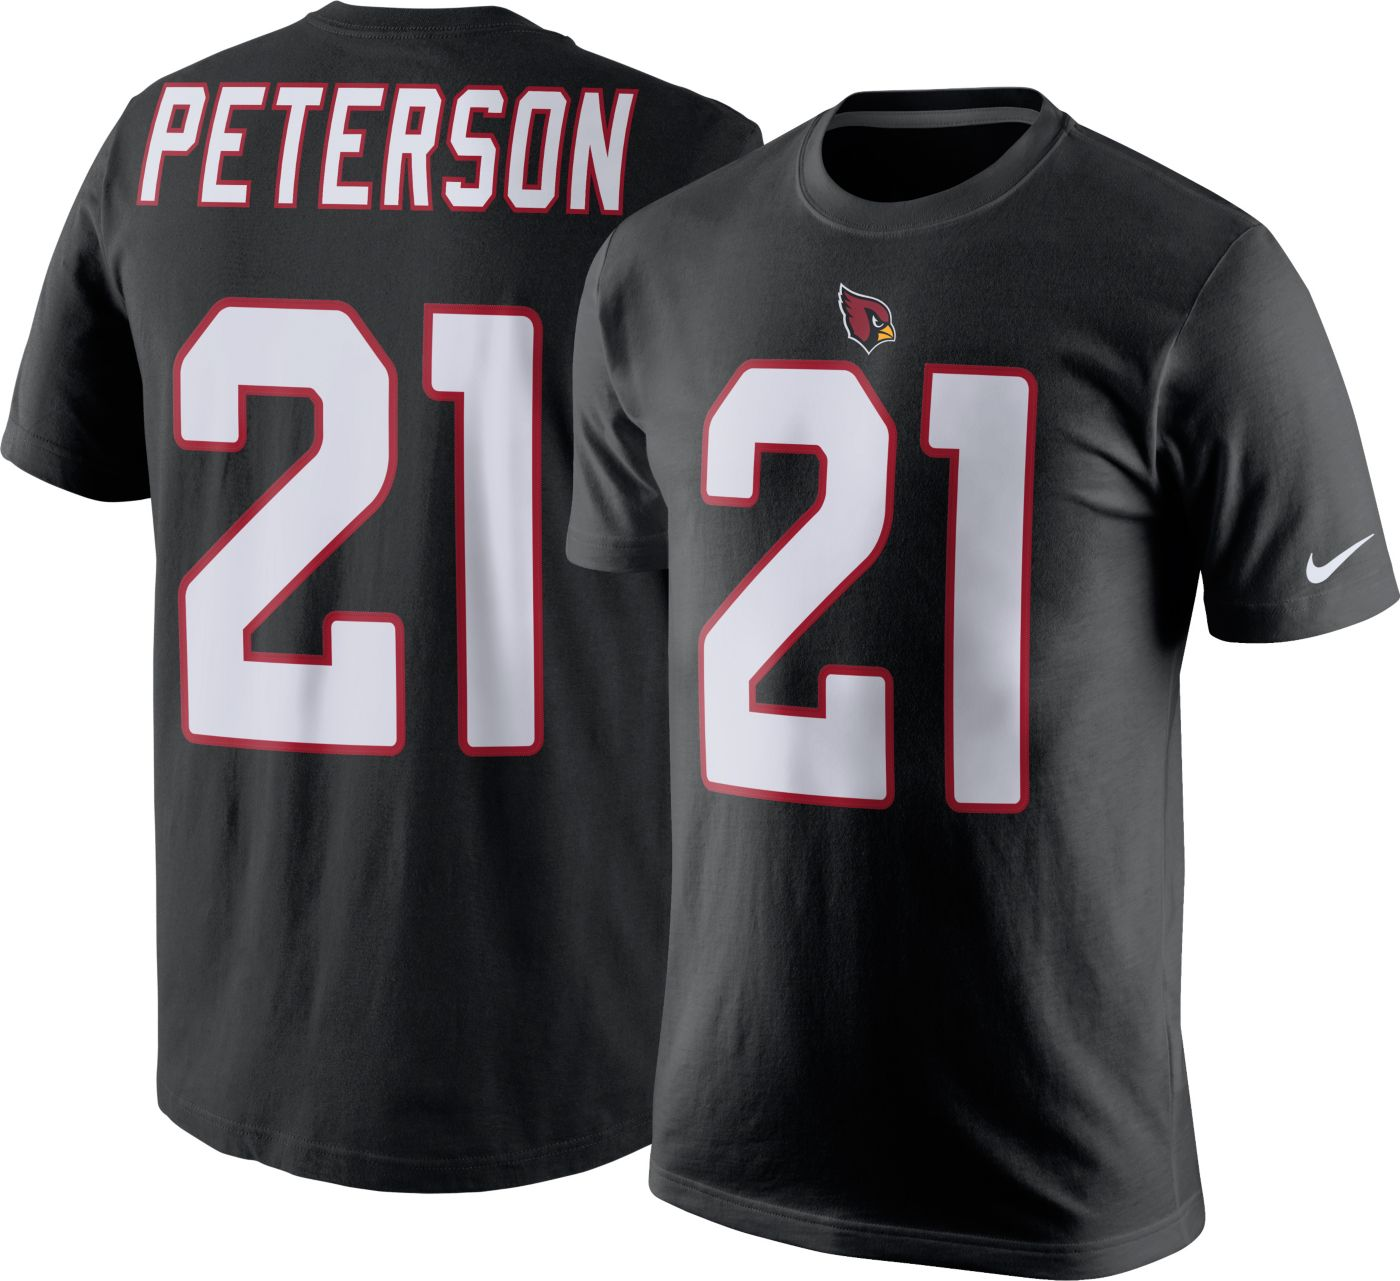 Nike Men's Arizona Cardinals Patrick Peterson #21 Pride Black T-Shirt